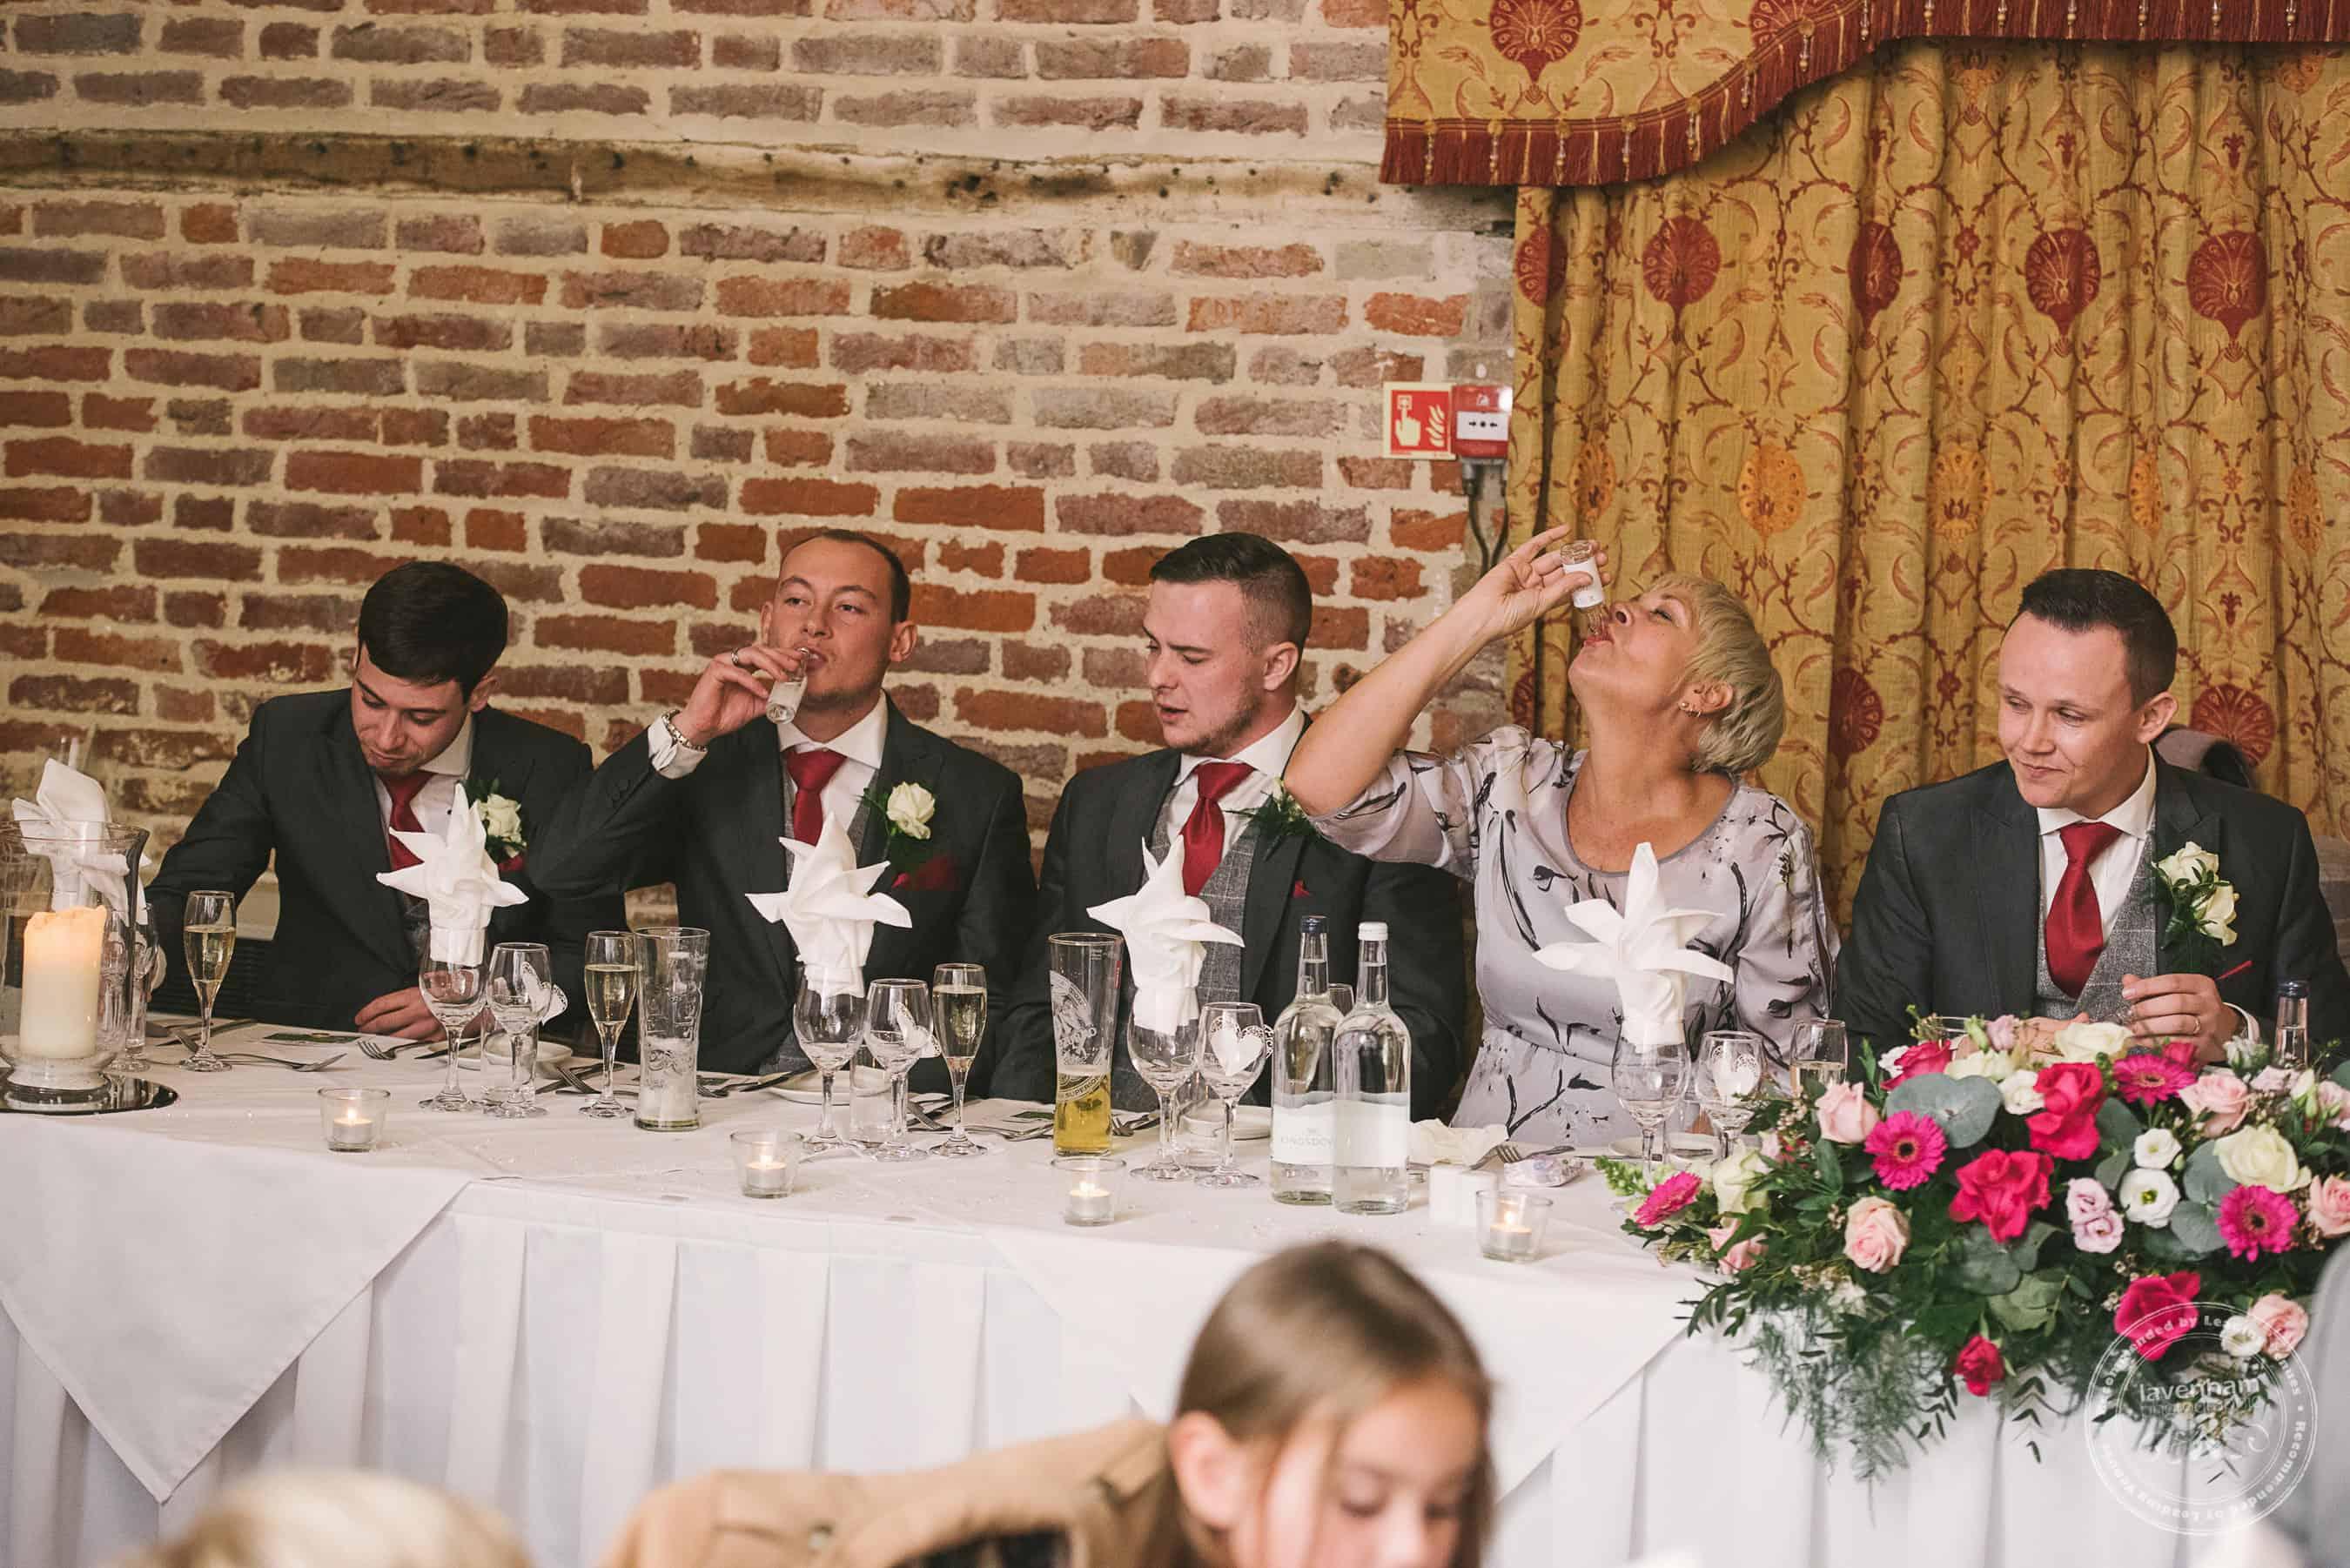 251118 Leez Priory Wedding Photography by Lavenham Photographic 105